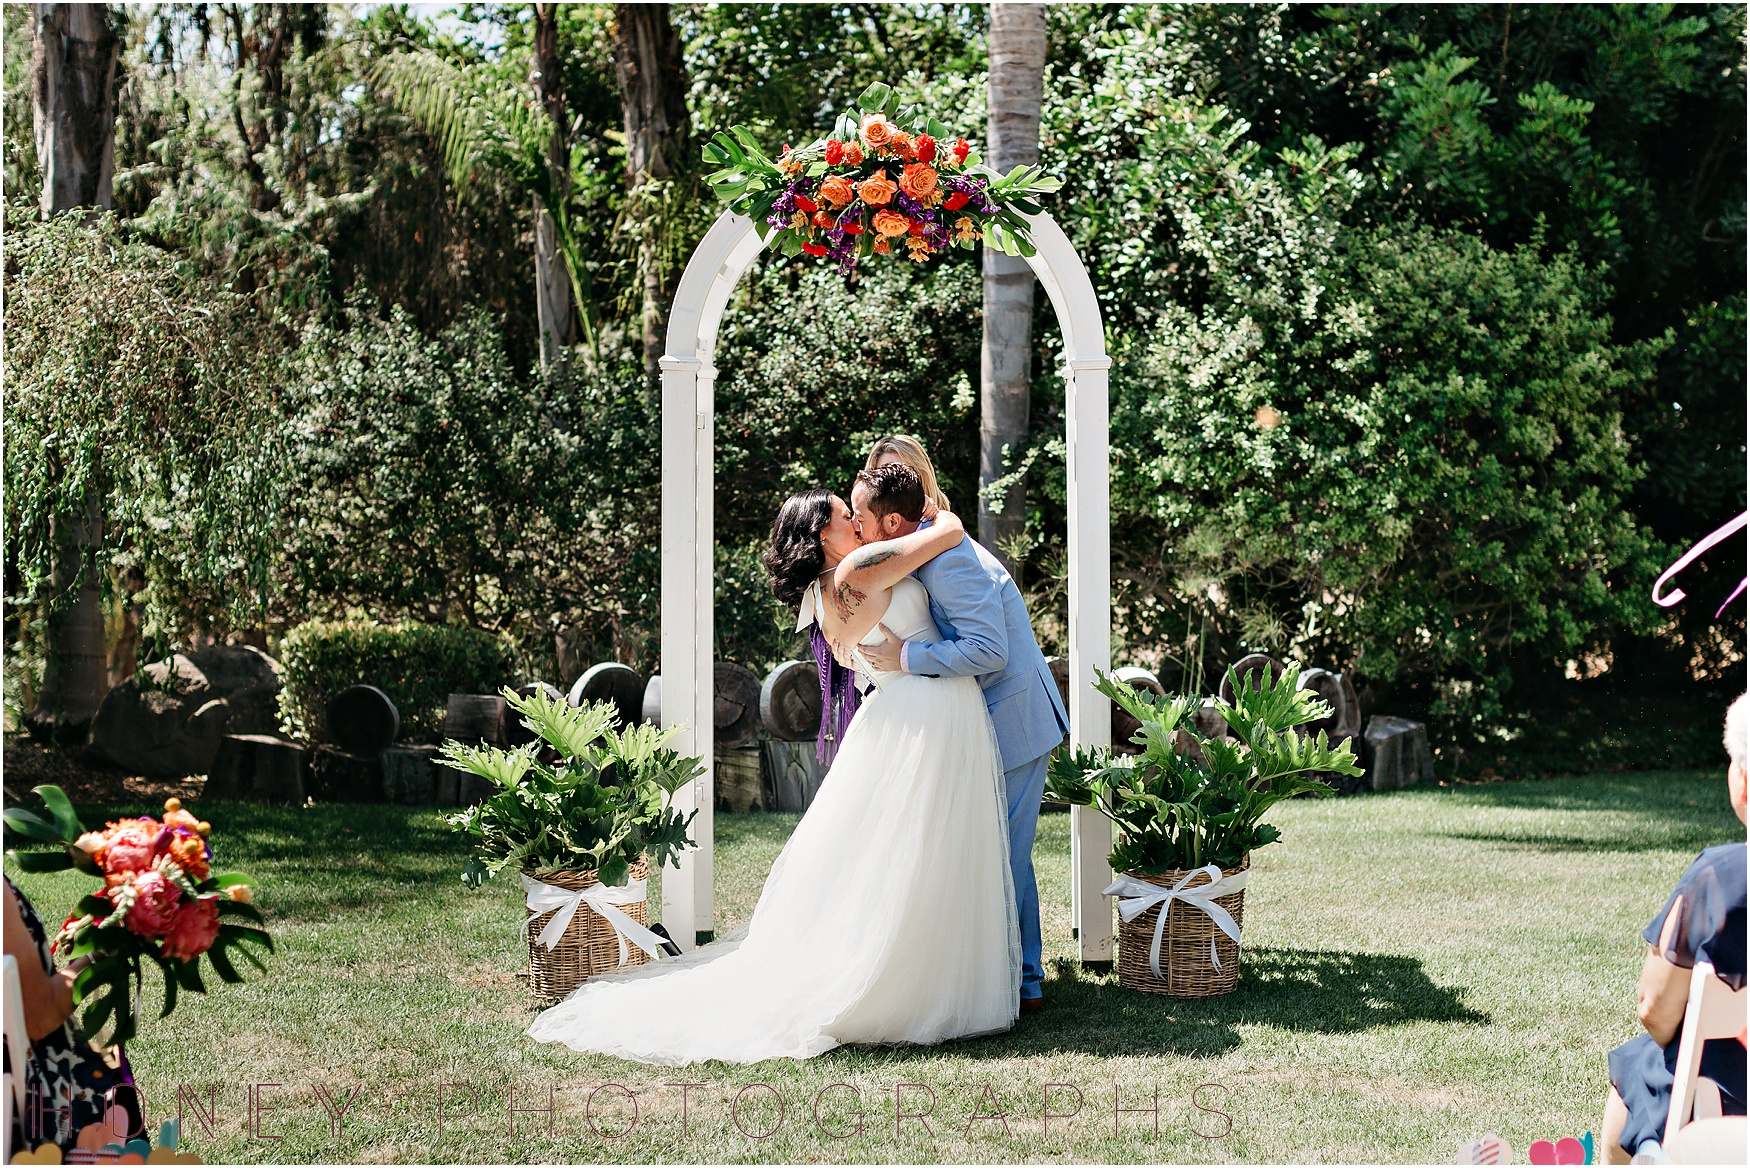 colorful_ecclectic_vibrant_vista_rainbow_quirky_wedding023.jpg